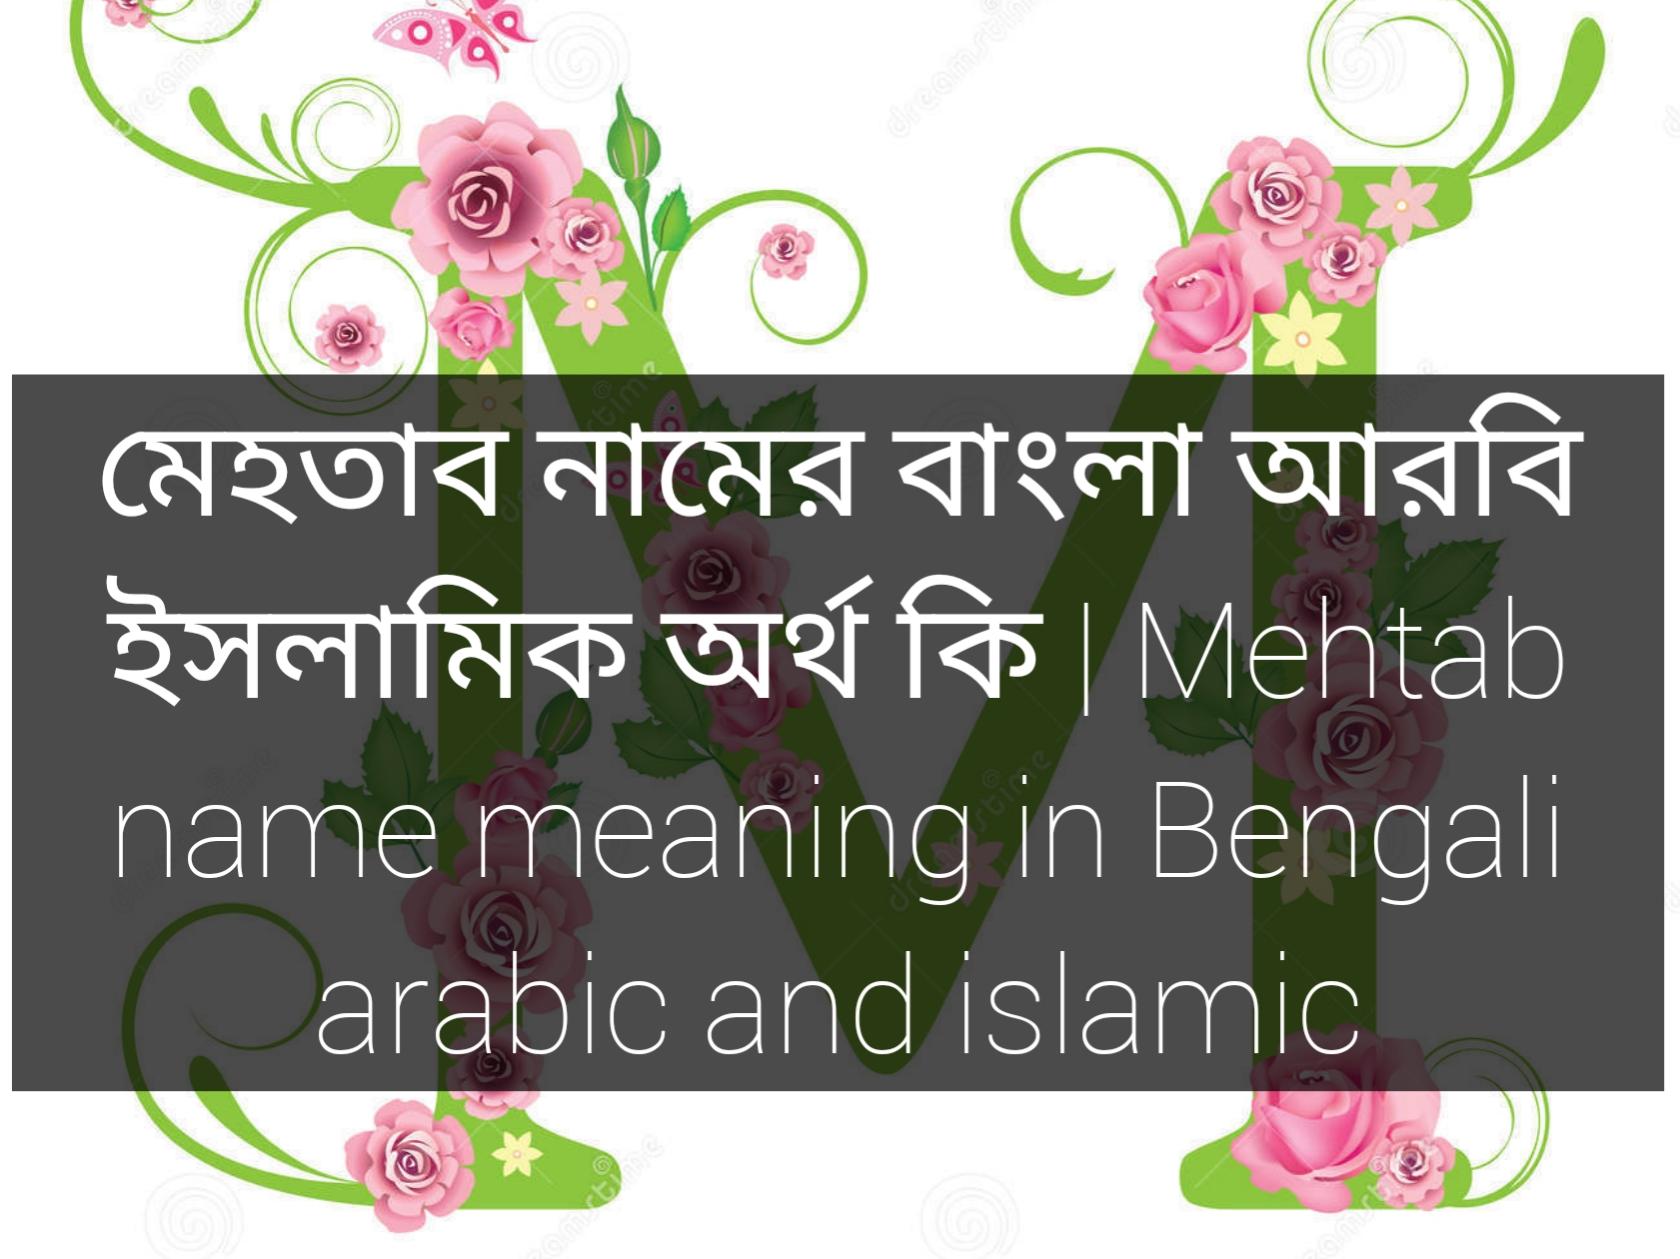 abram name meaning in Bengali, মেহতাব নামের অর্থ কি, মেহতাব নামের বাংলা অর্থ কি, মেহতাব নামের ইসলামিক অর্থ কি,